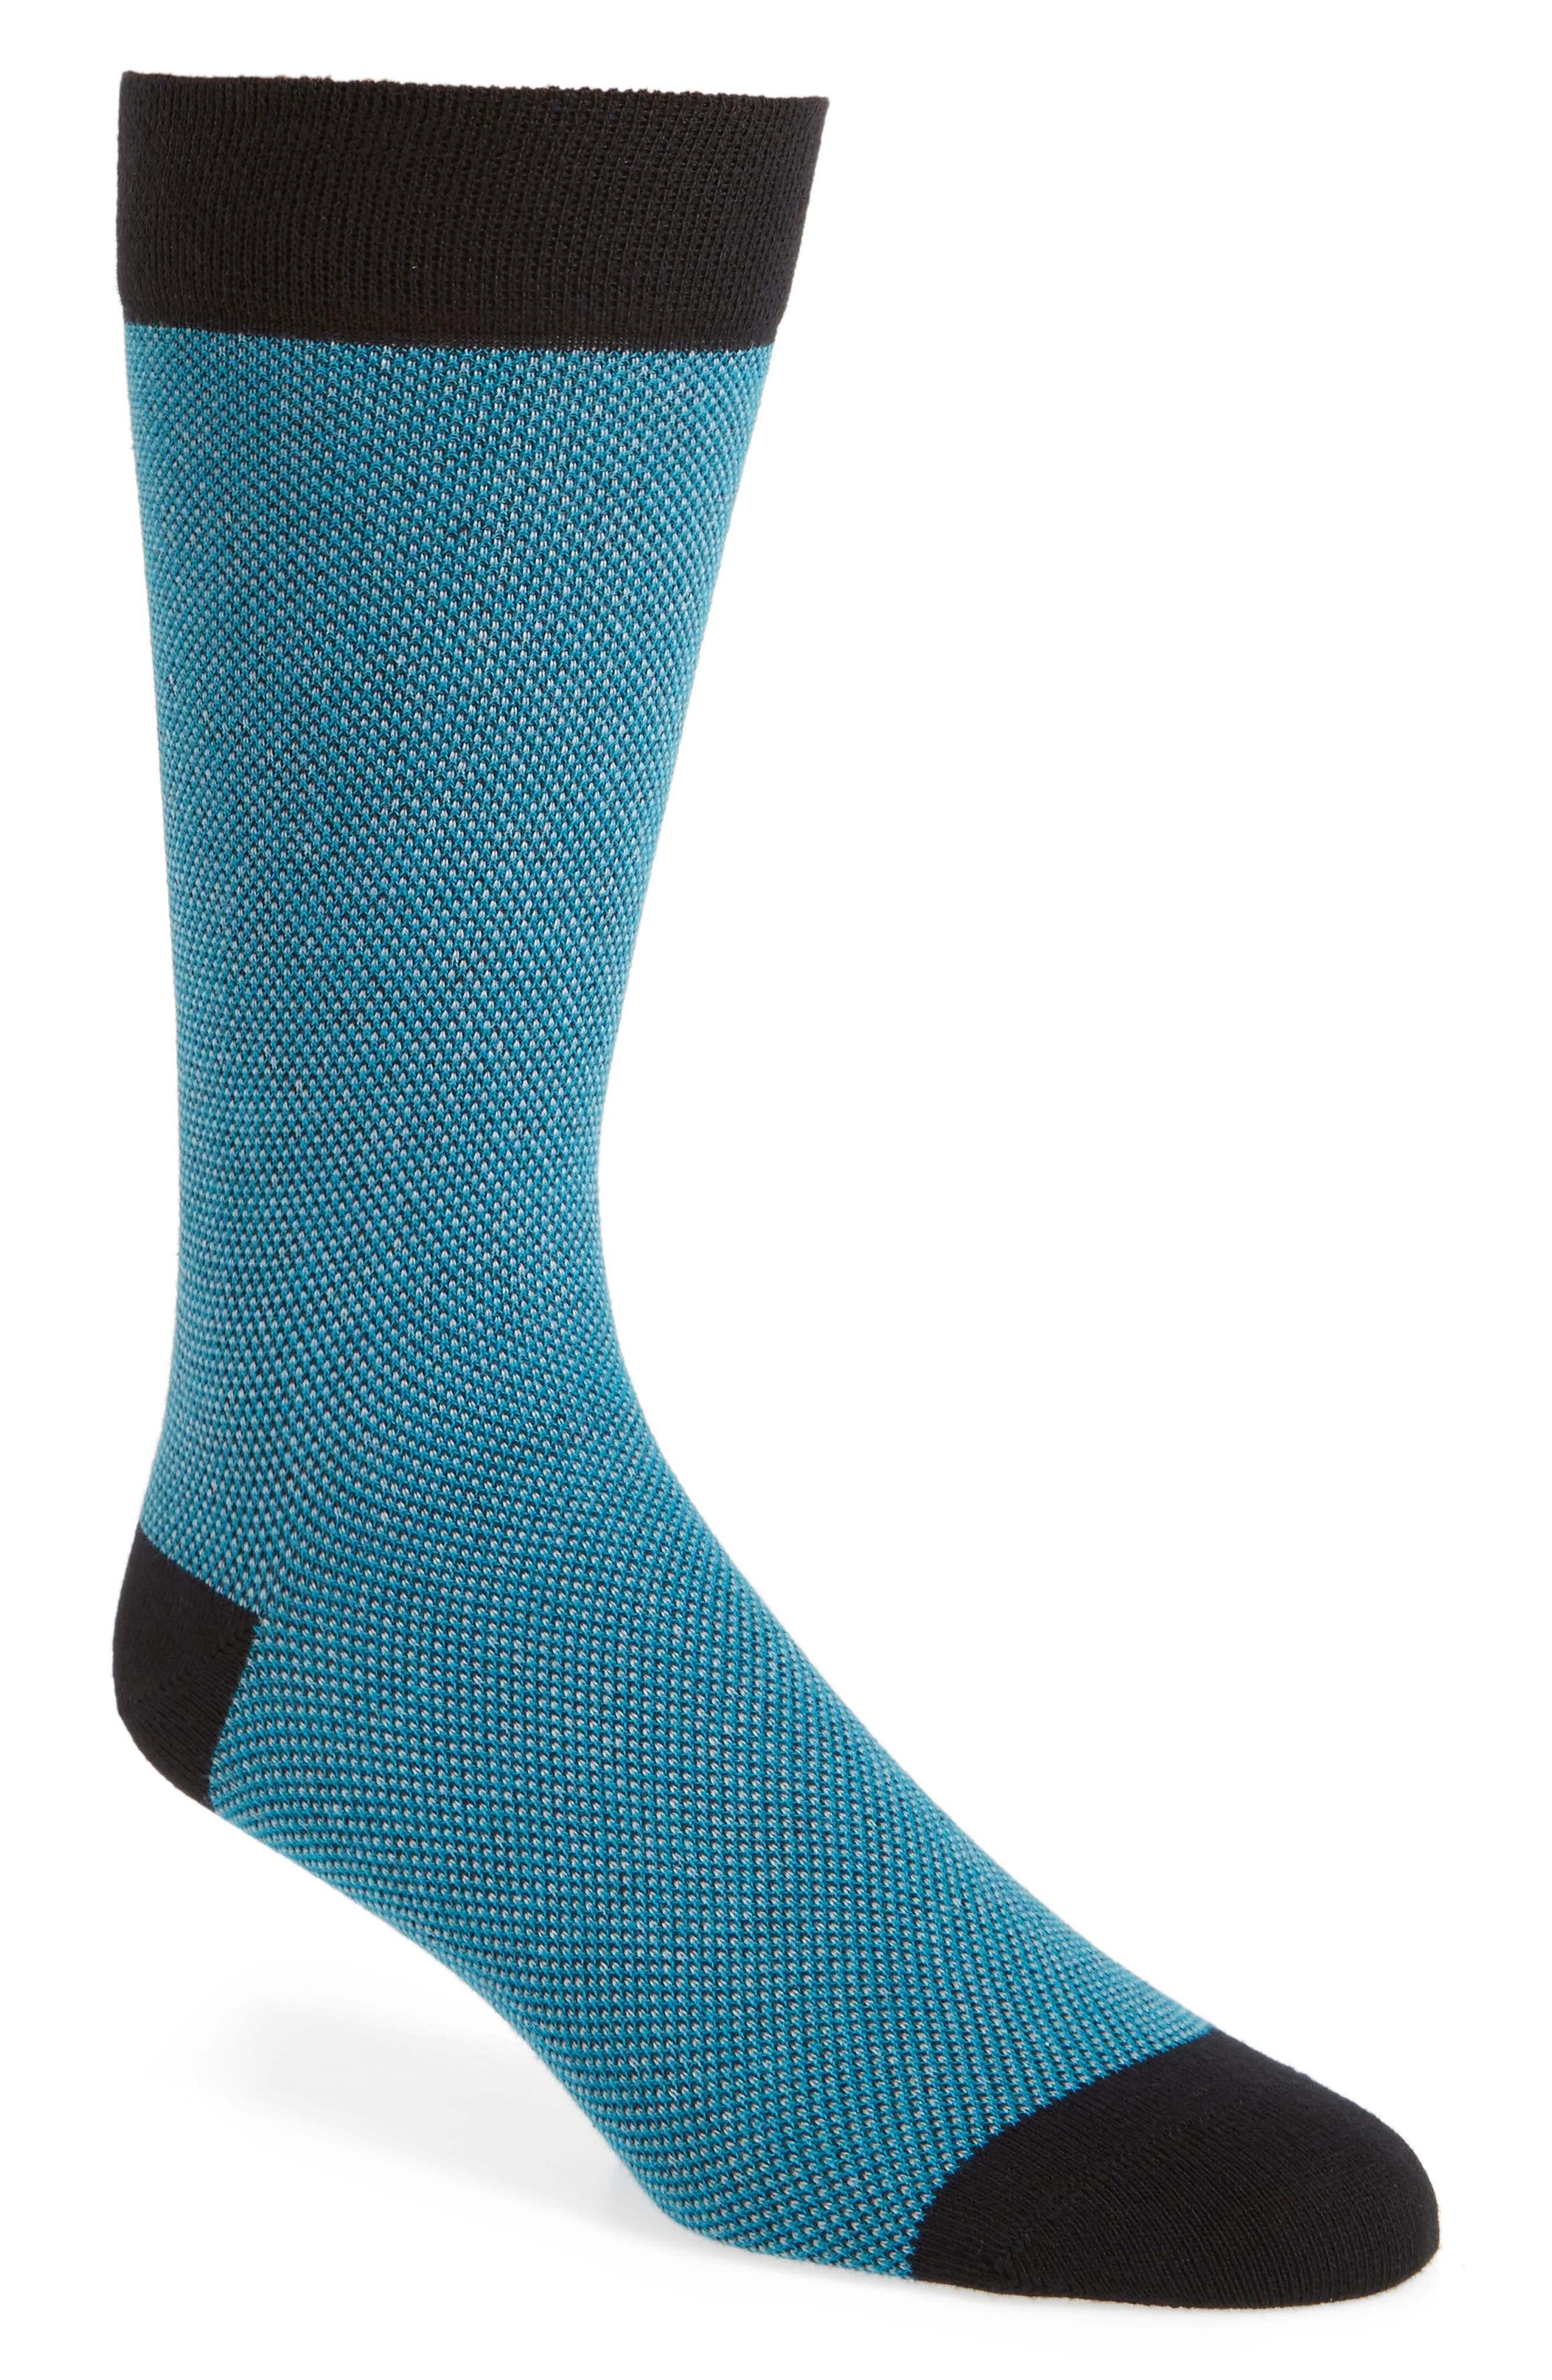 Joaquim Solid Socks,                         Main,                         color,